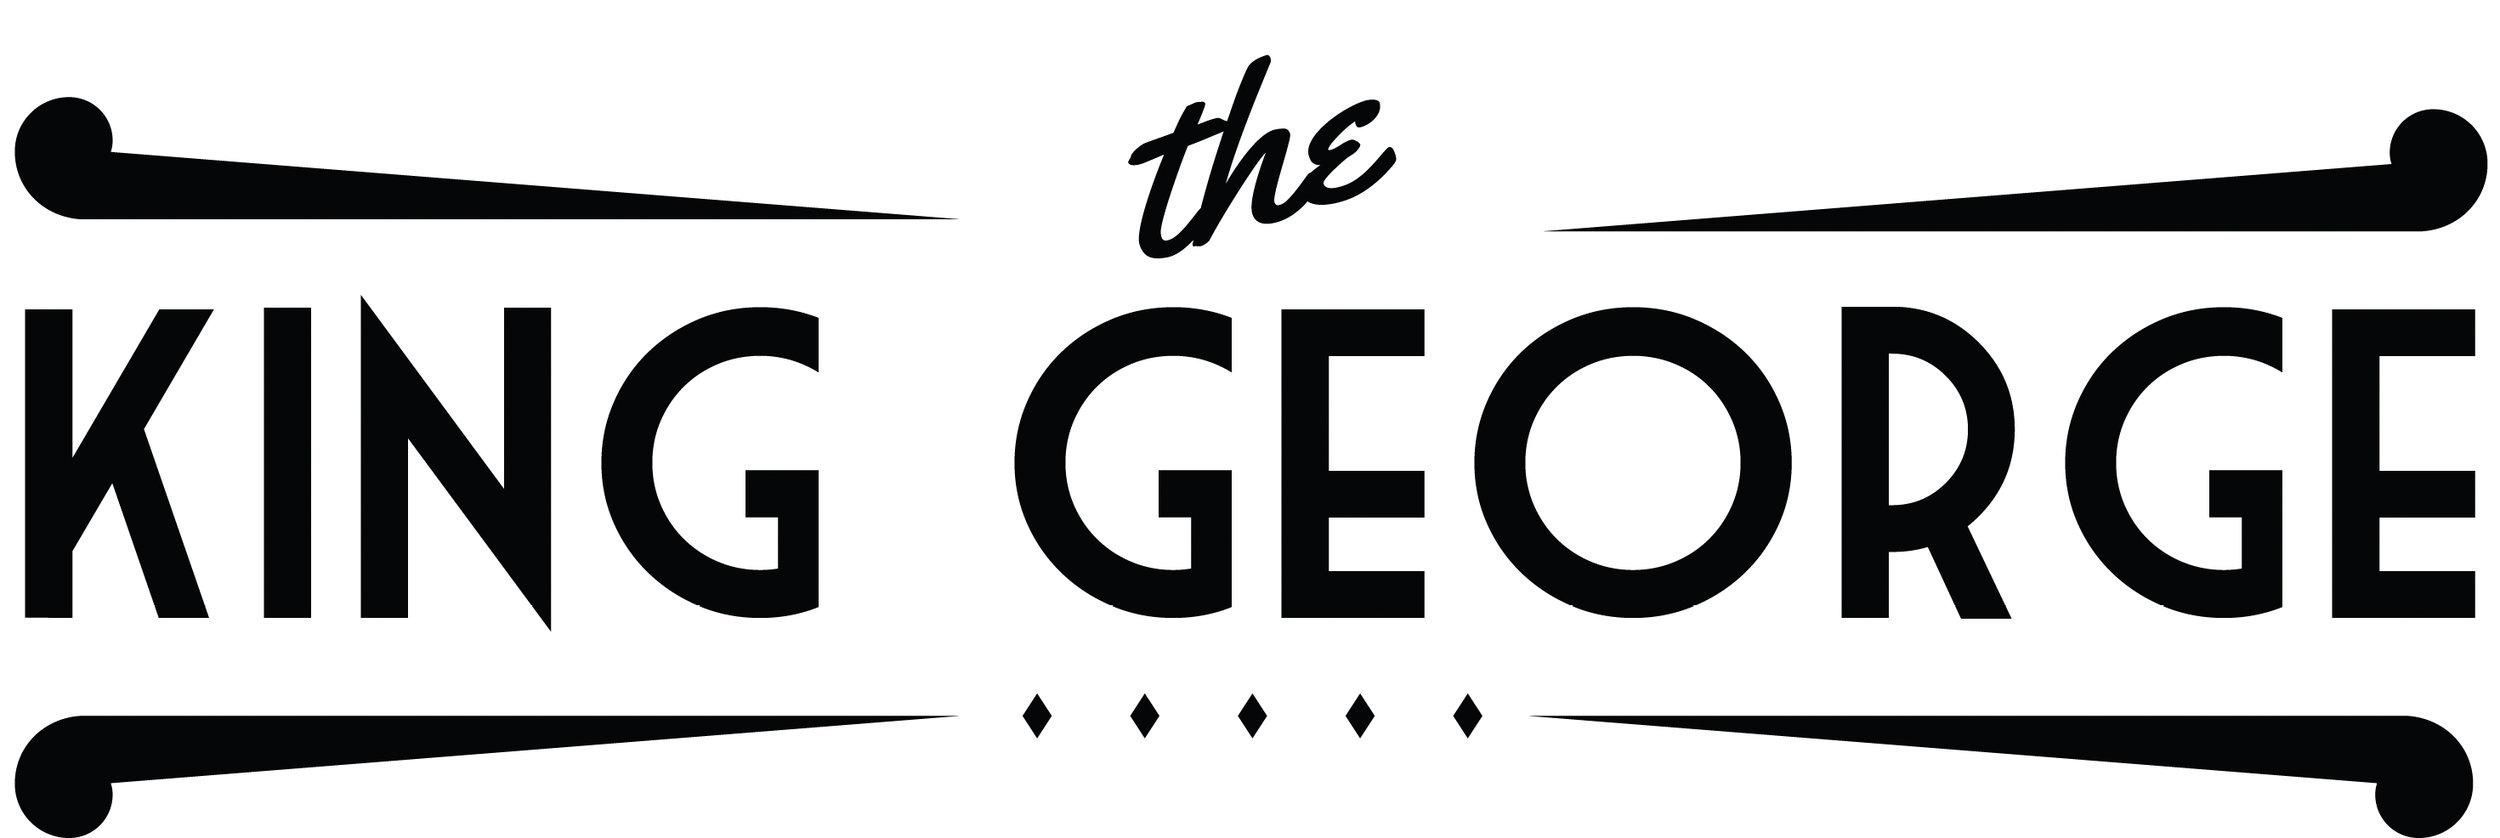 king george logo.jpg